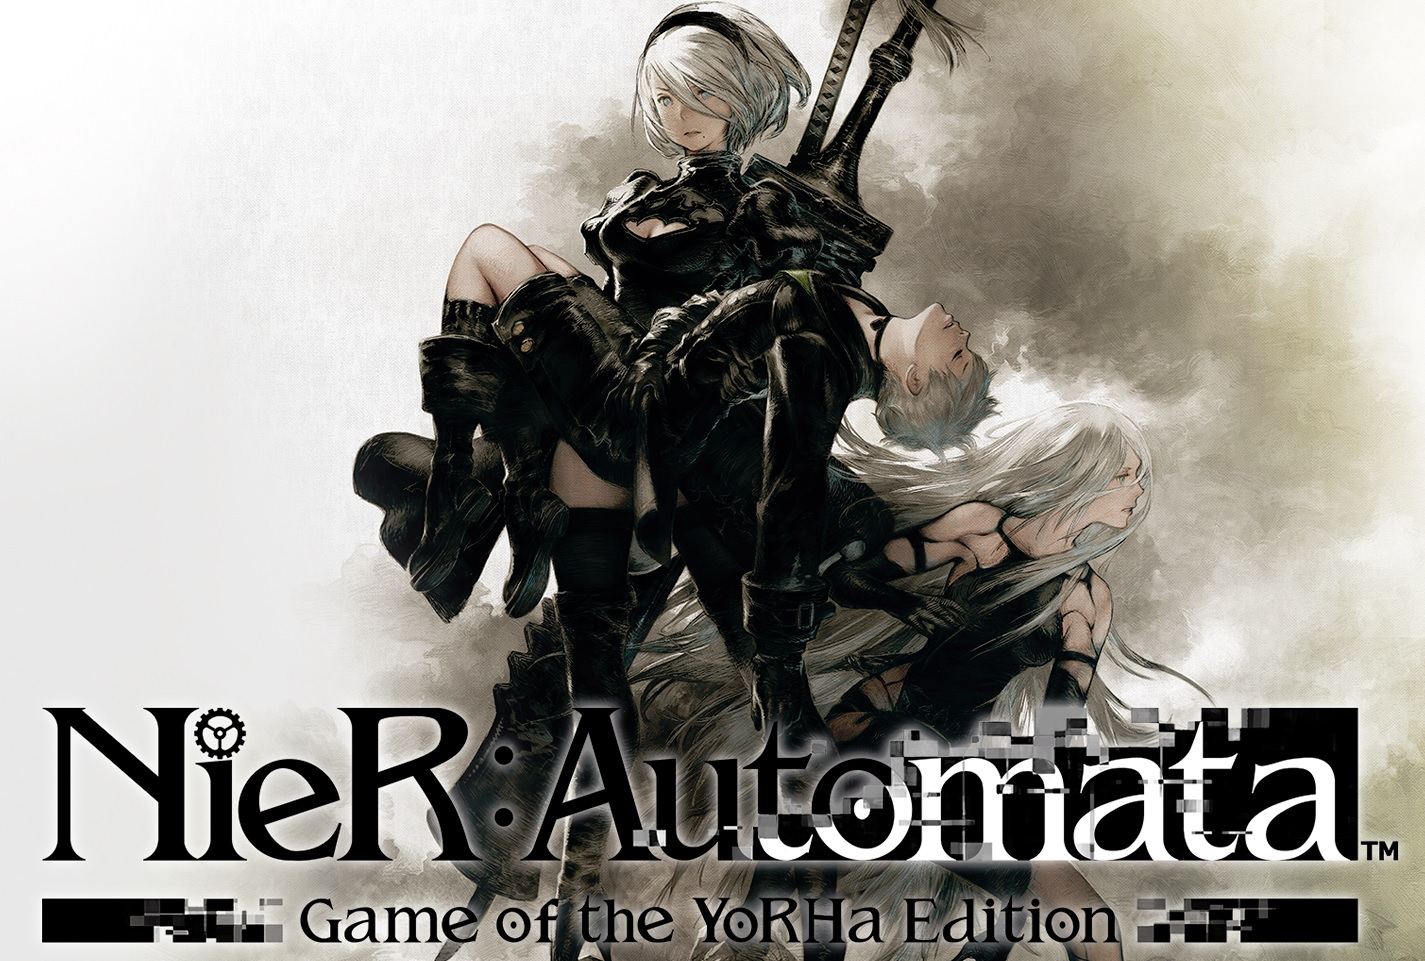 NieR: Automata (Game of the YoRHa Edition)